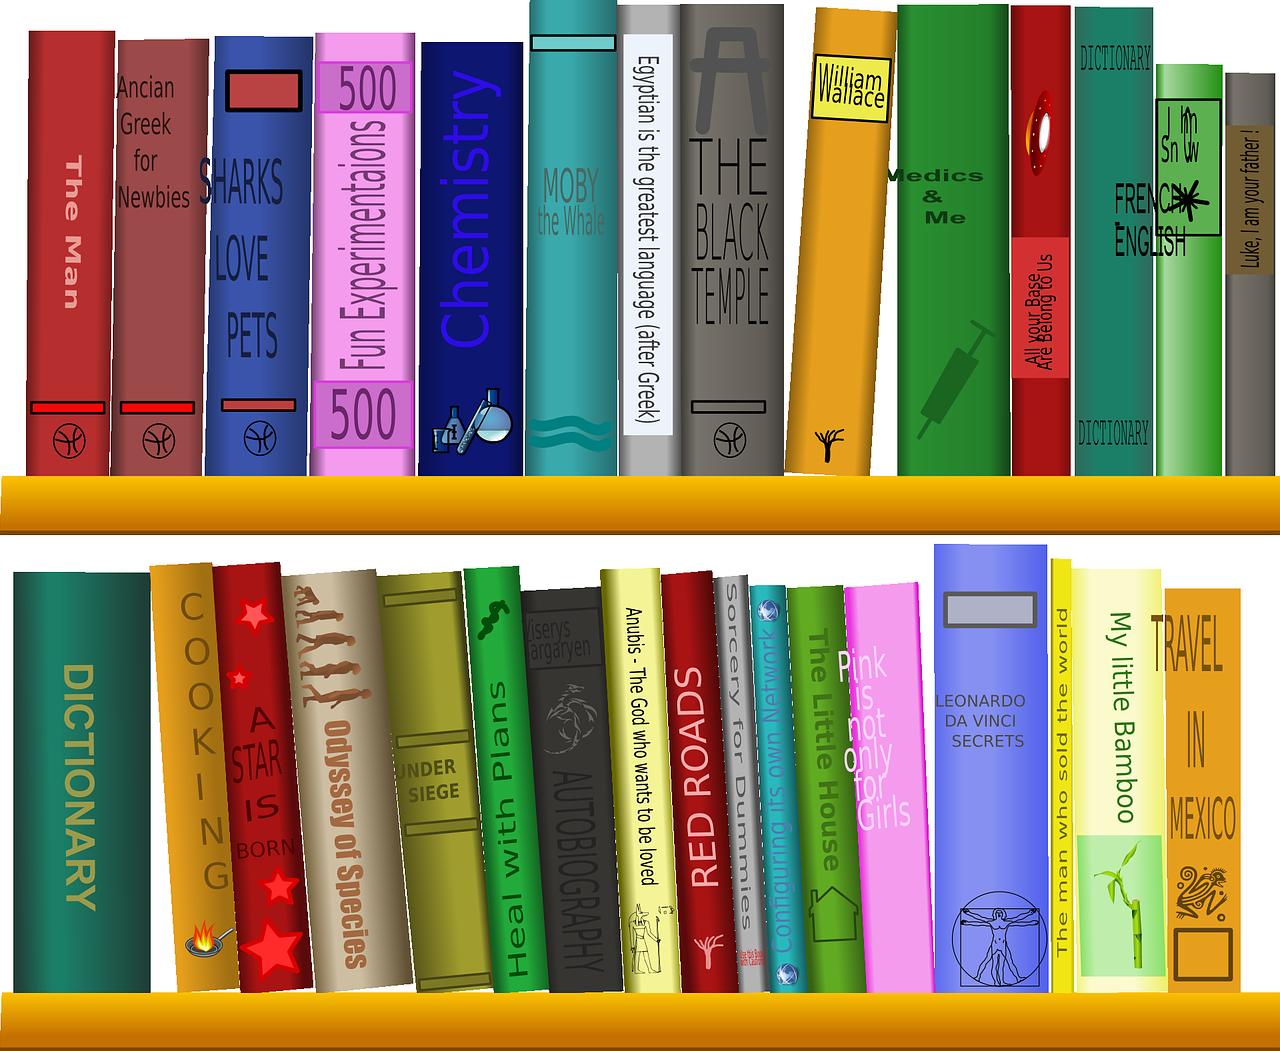 shelf-159852_1280.png